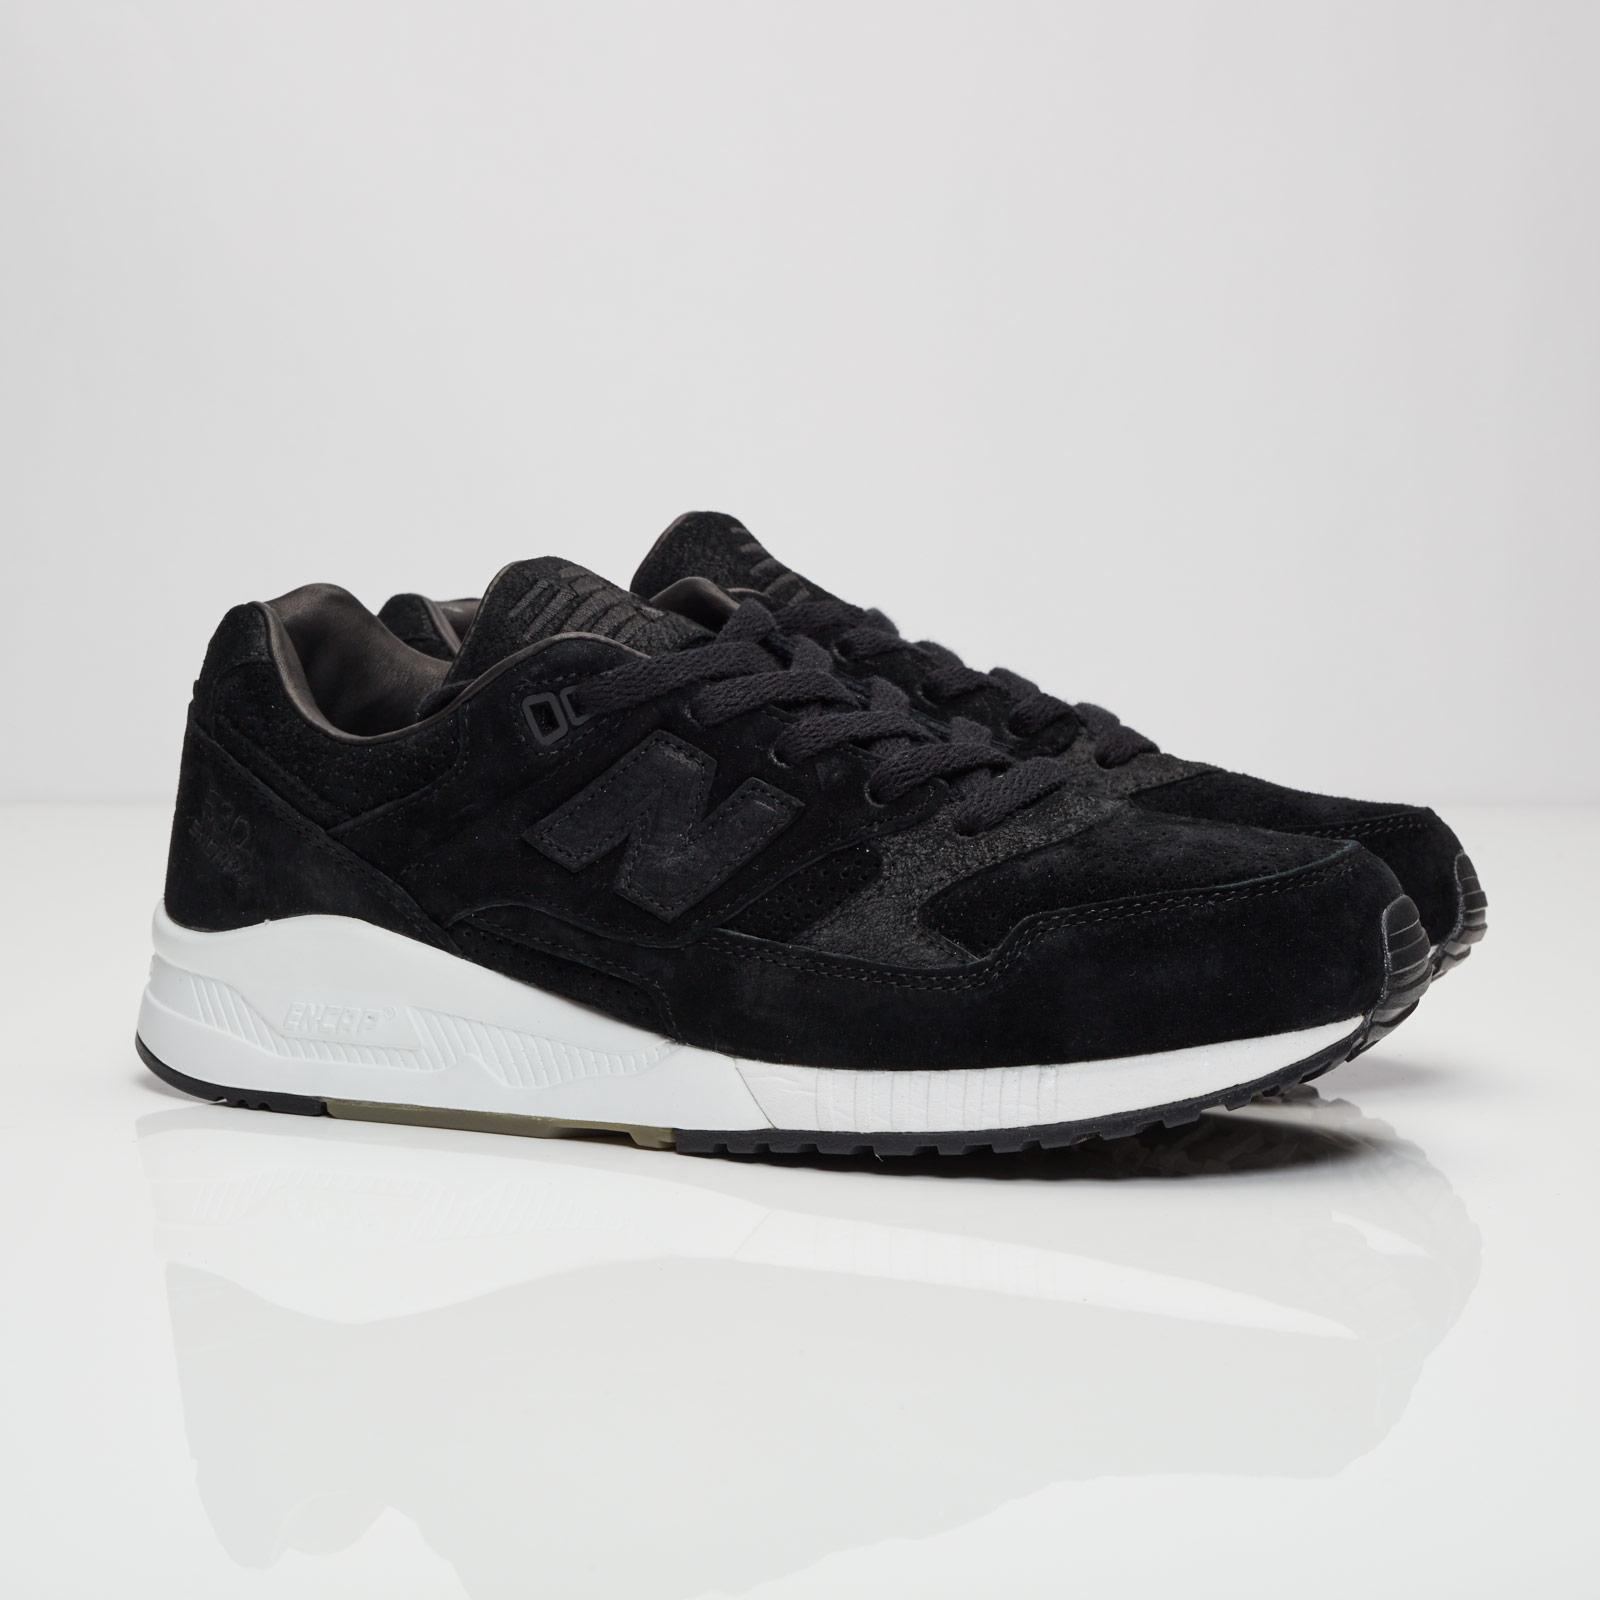 newest 1c969 7e3ec New Balance M530 - M530rcb - Sneakersnstuff   sneakers ...